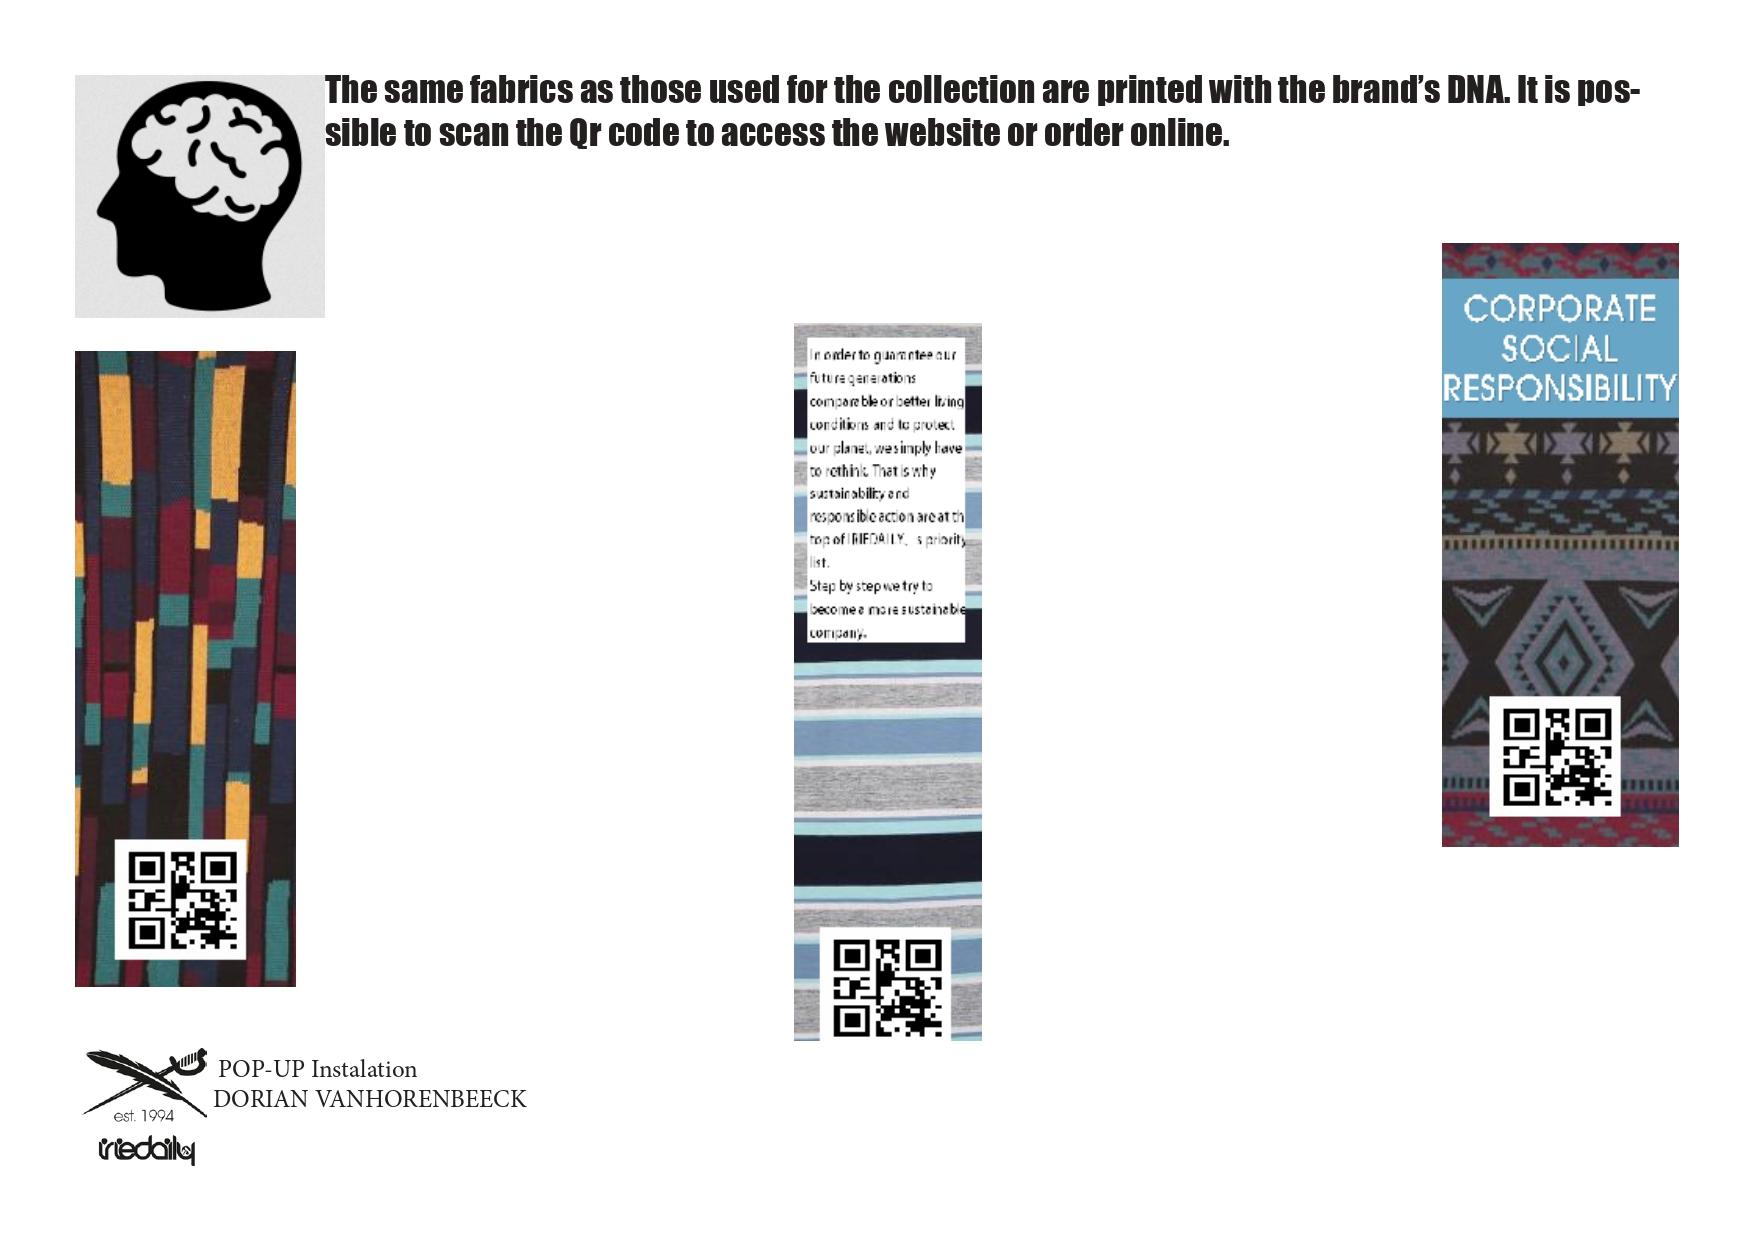 Exam18-01-21 Pre Dorian Vanhorenbeeck_page-0009